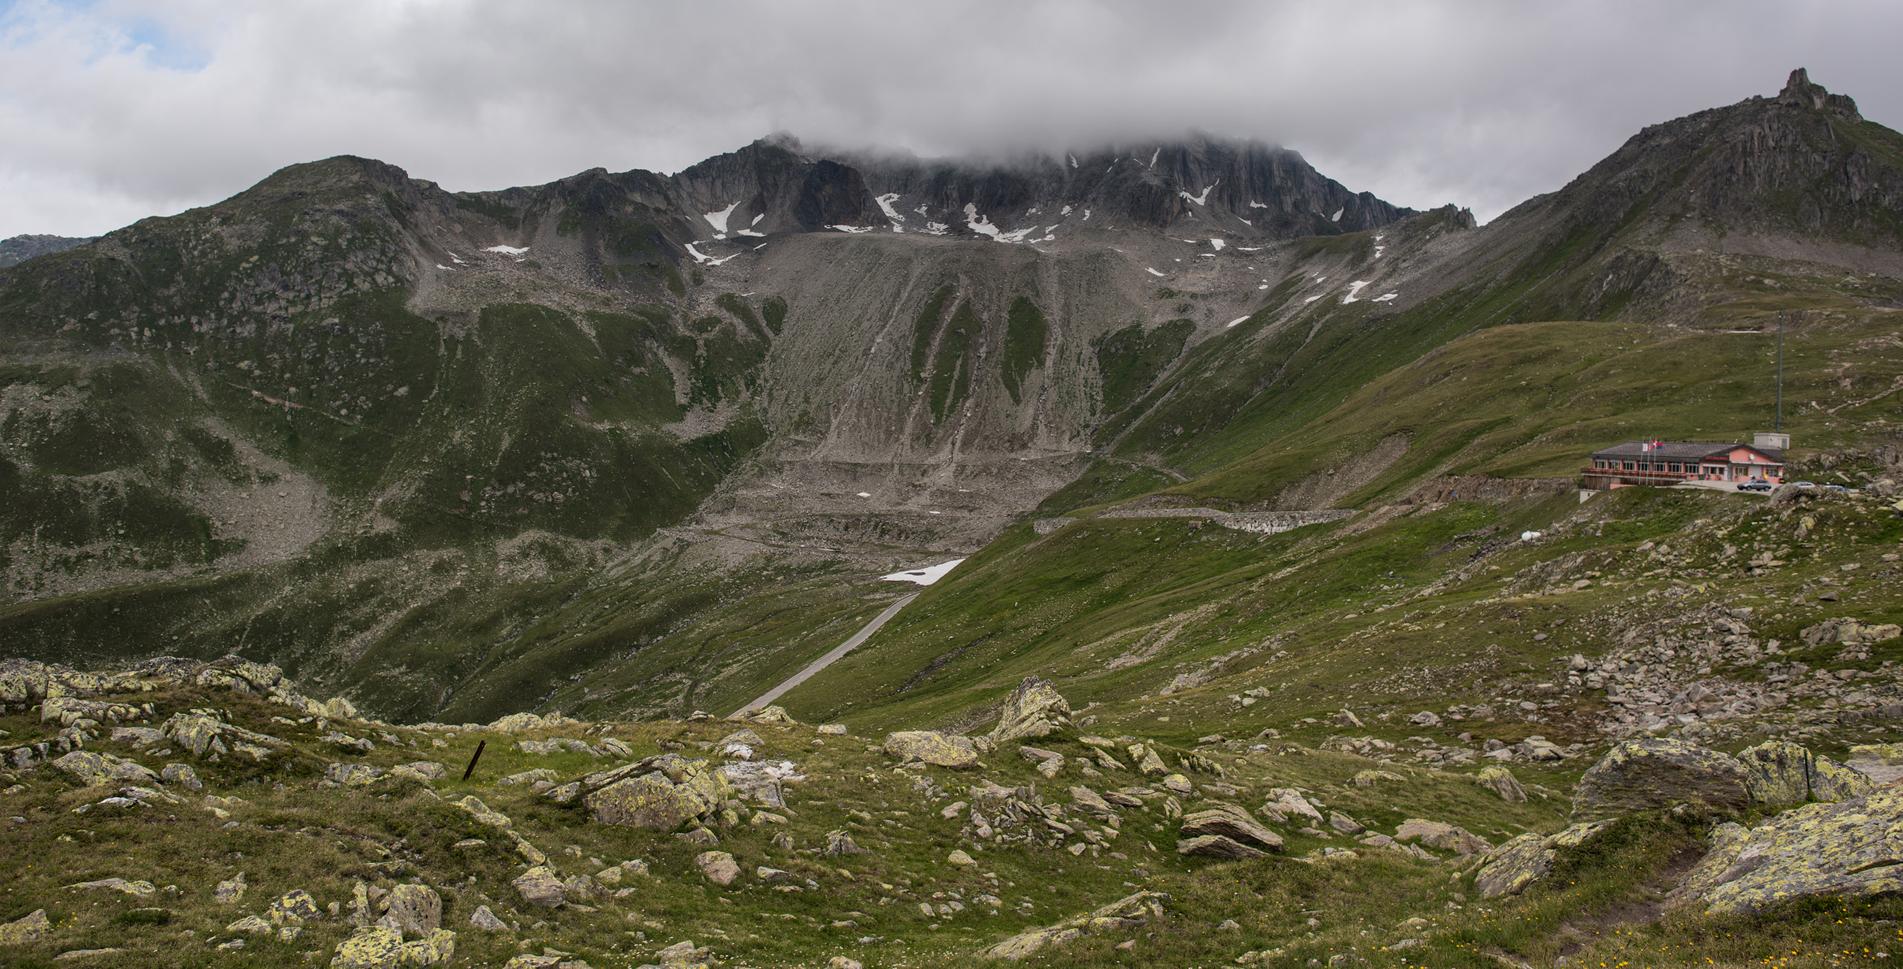 4. Etappe der Wanderung auf dem Vier-Quellen-Weg von der Capanna Piansecco CAS / Pianseccohütte im Val Bedretto / Bedrettotal via Alpe di Cassina, Nufenenpass, Ticino-Quelle, Ladstafel nach Obergesteln im Goms (Wallis)